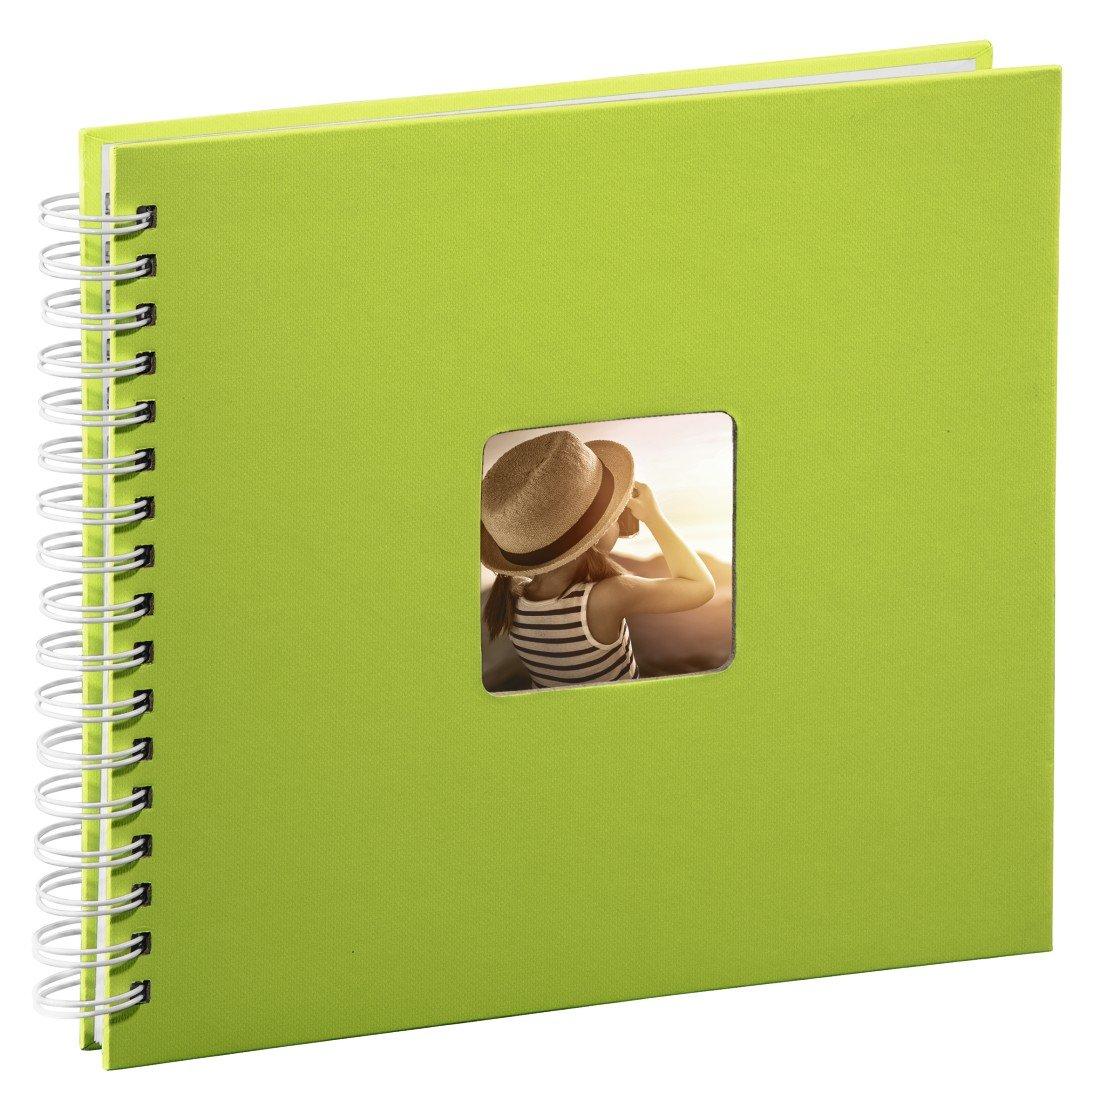 Hama Fine Art Papel Gris álbum de Foto y Protector - Álbum de fotografía (280 mm, 240 mm, Gris, Papel, 100 Hojas, 10 x 15 cm) 00002112